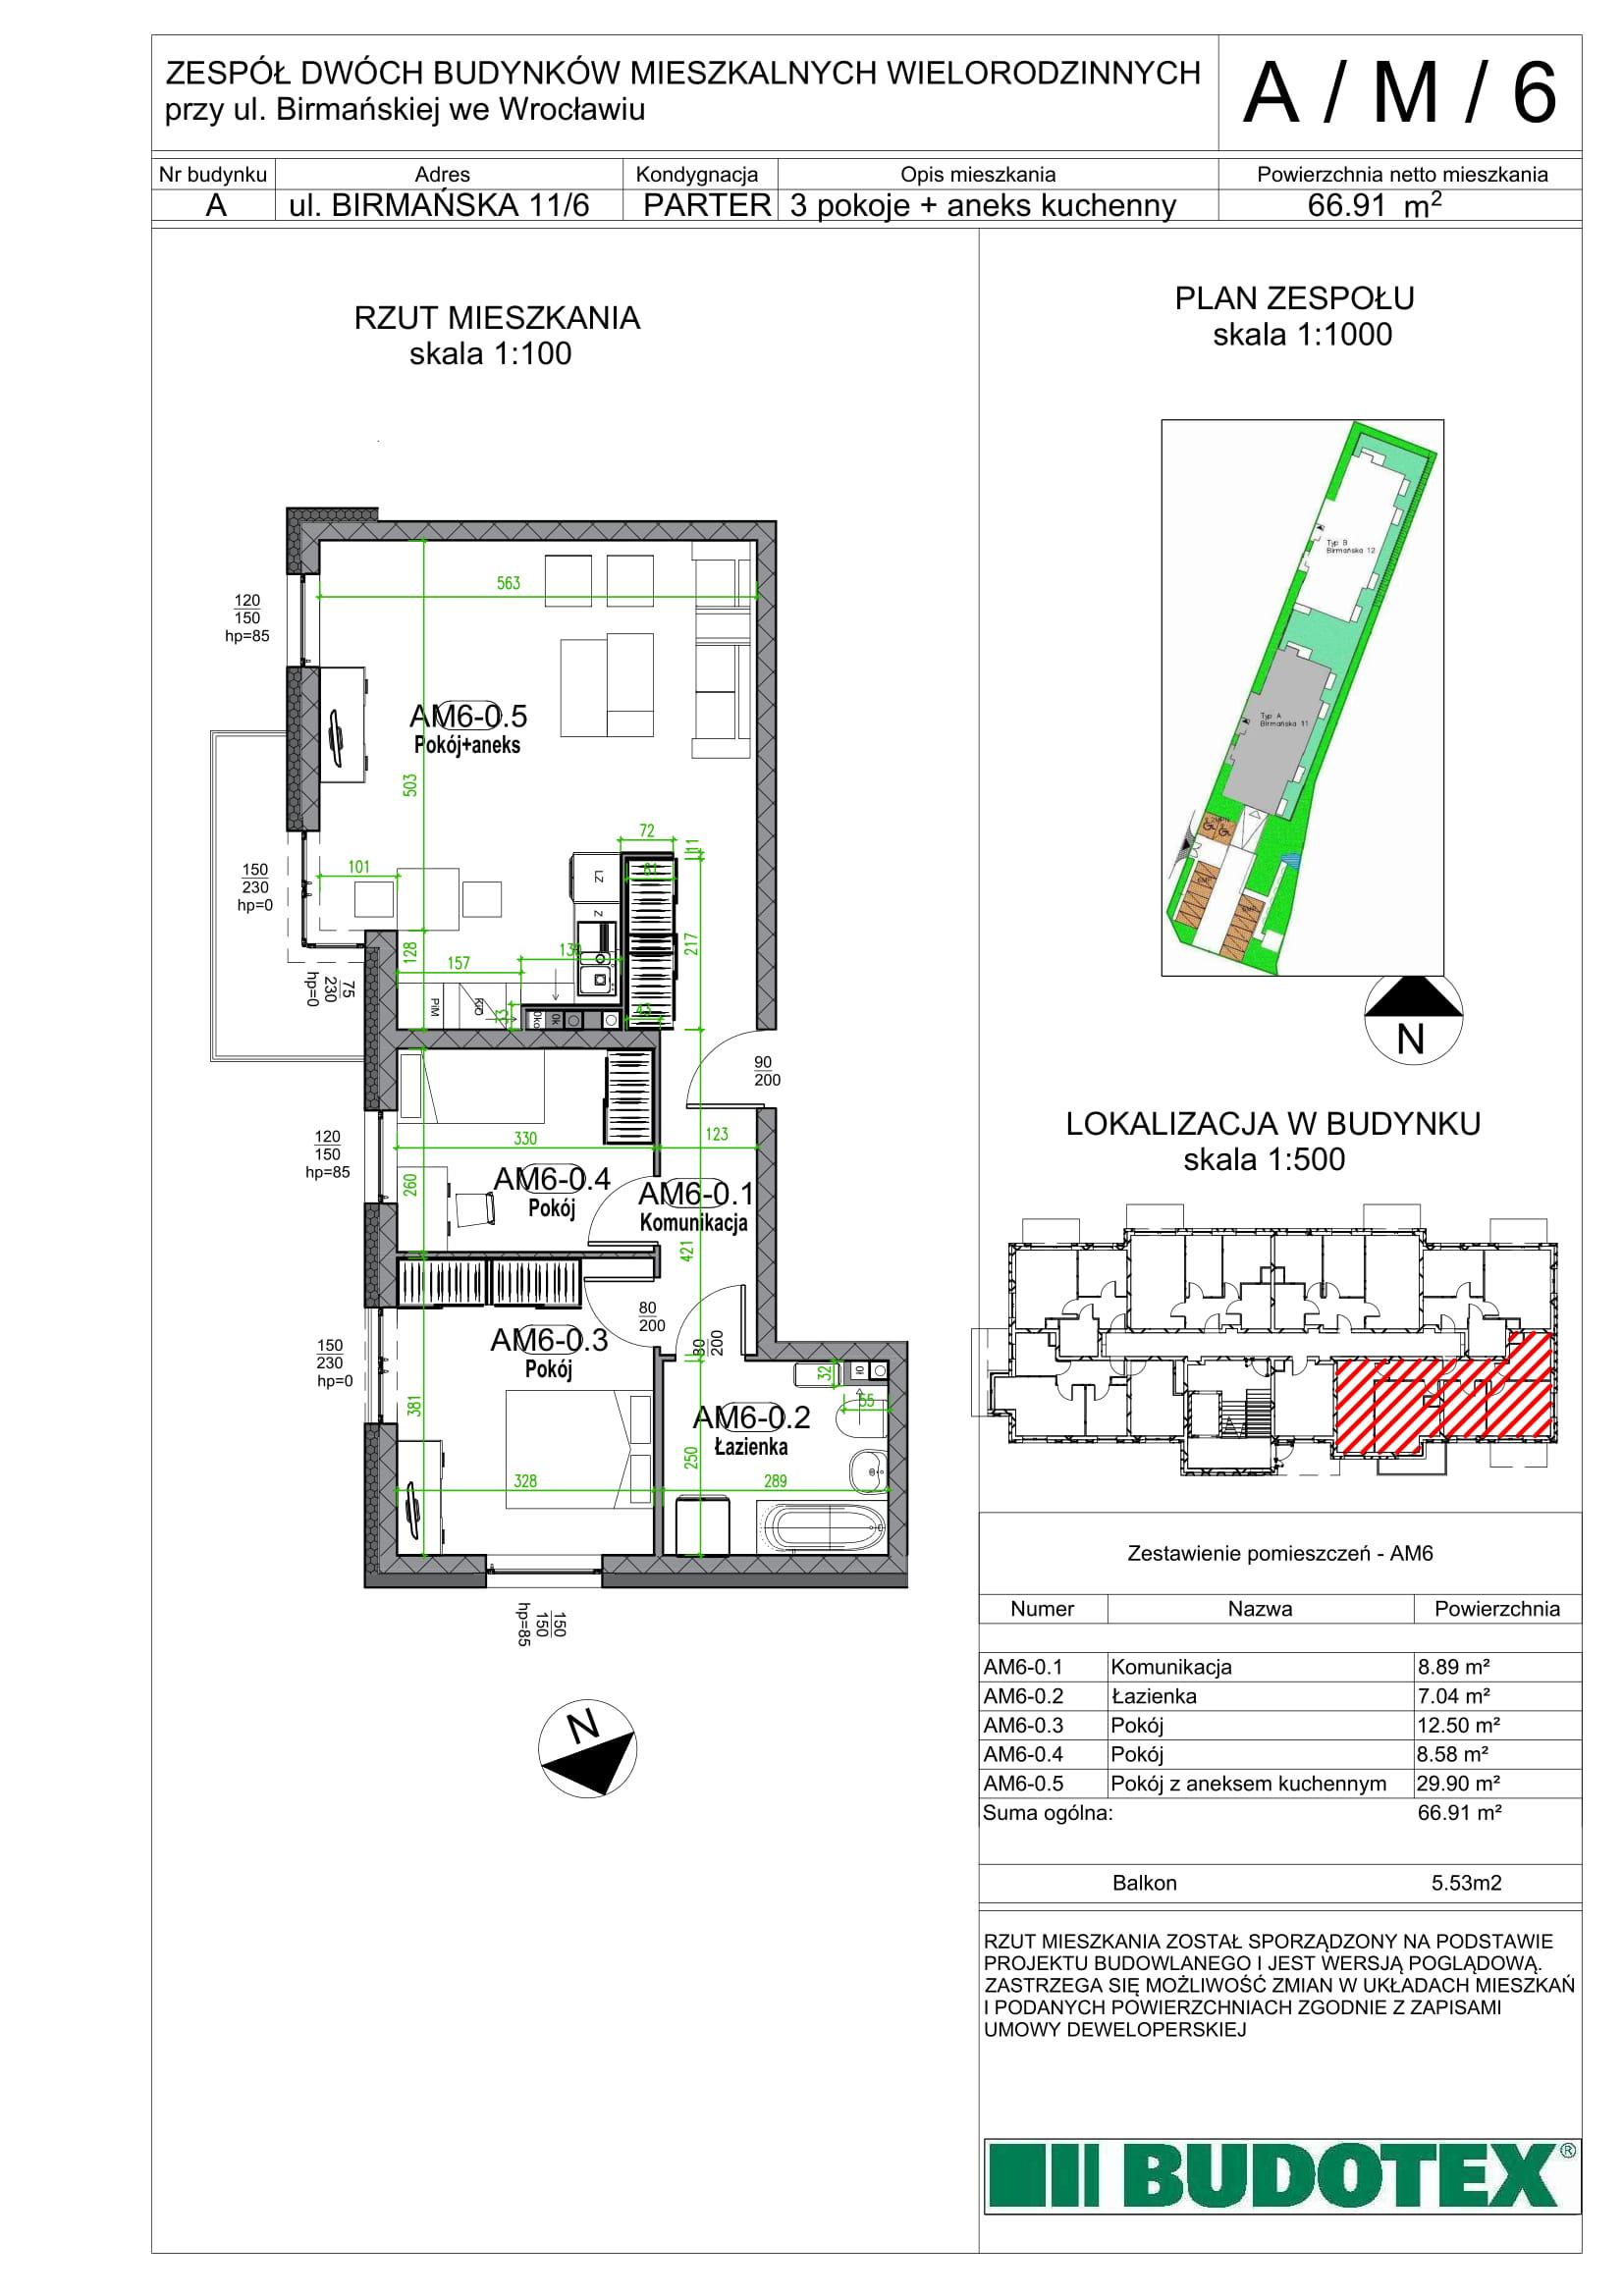 Mieszkanie nr A/M/06